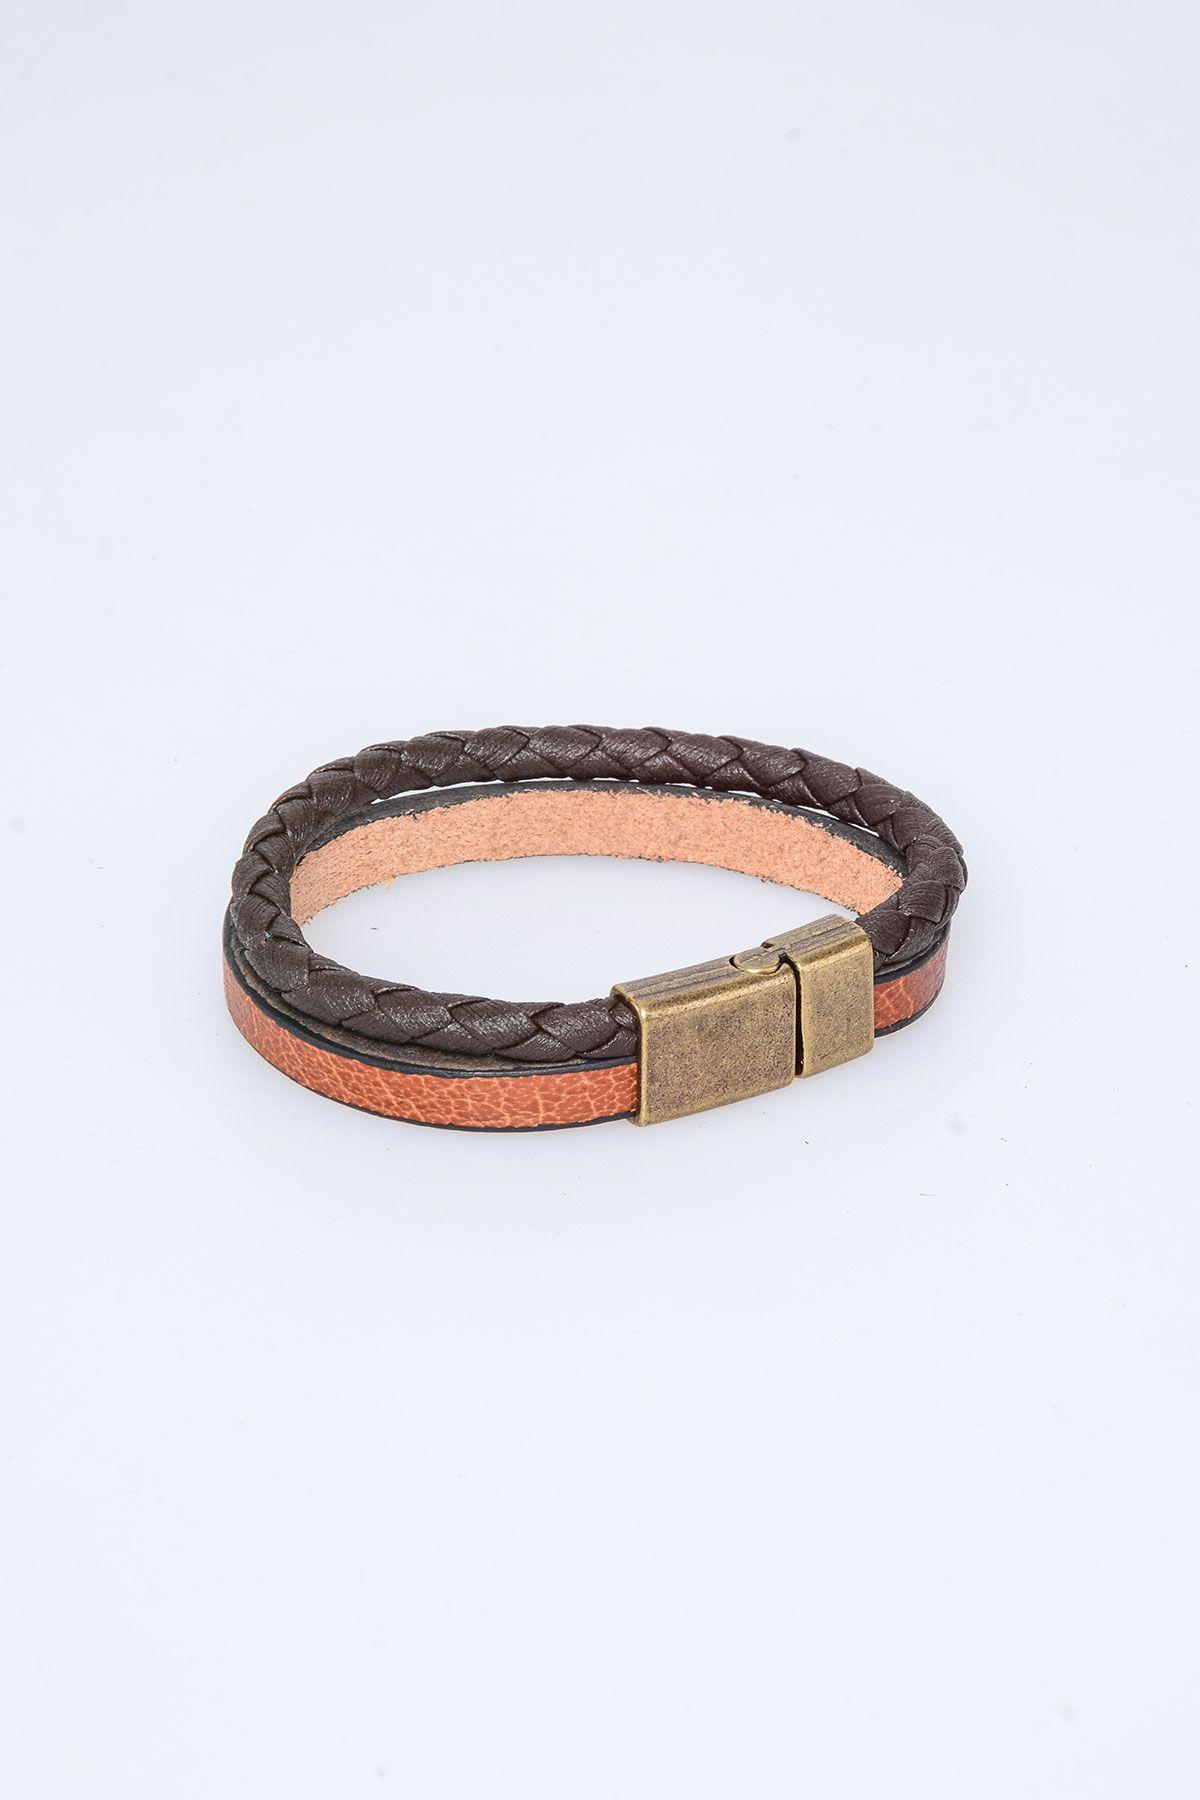 Pegia Genuine Leather Bracelet 19BL04 Brown